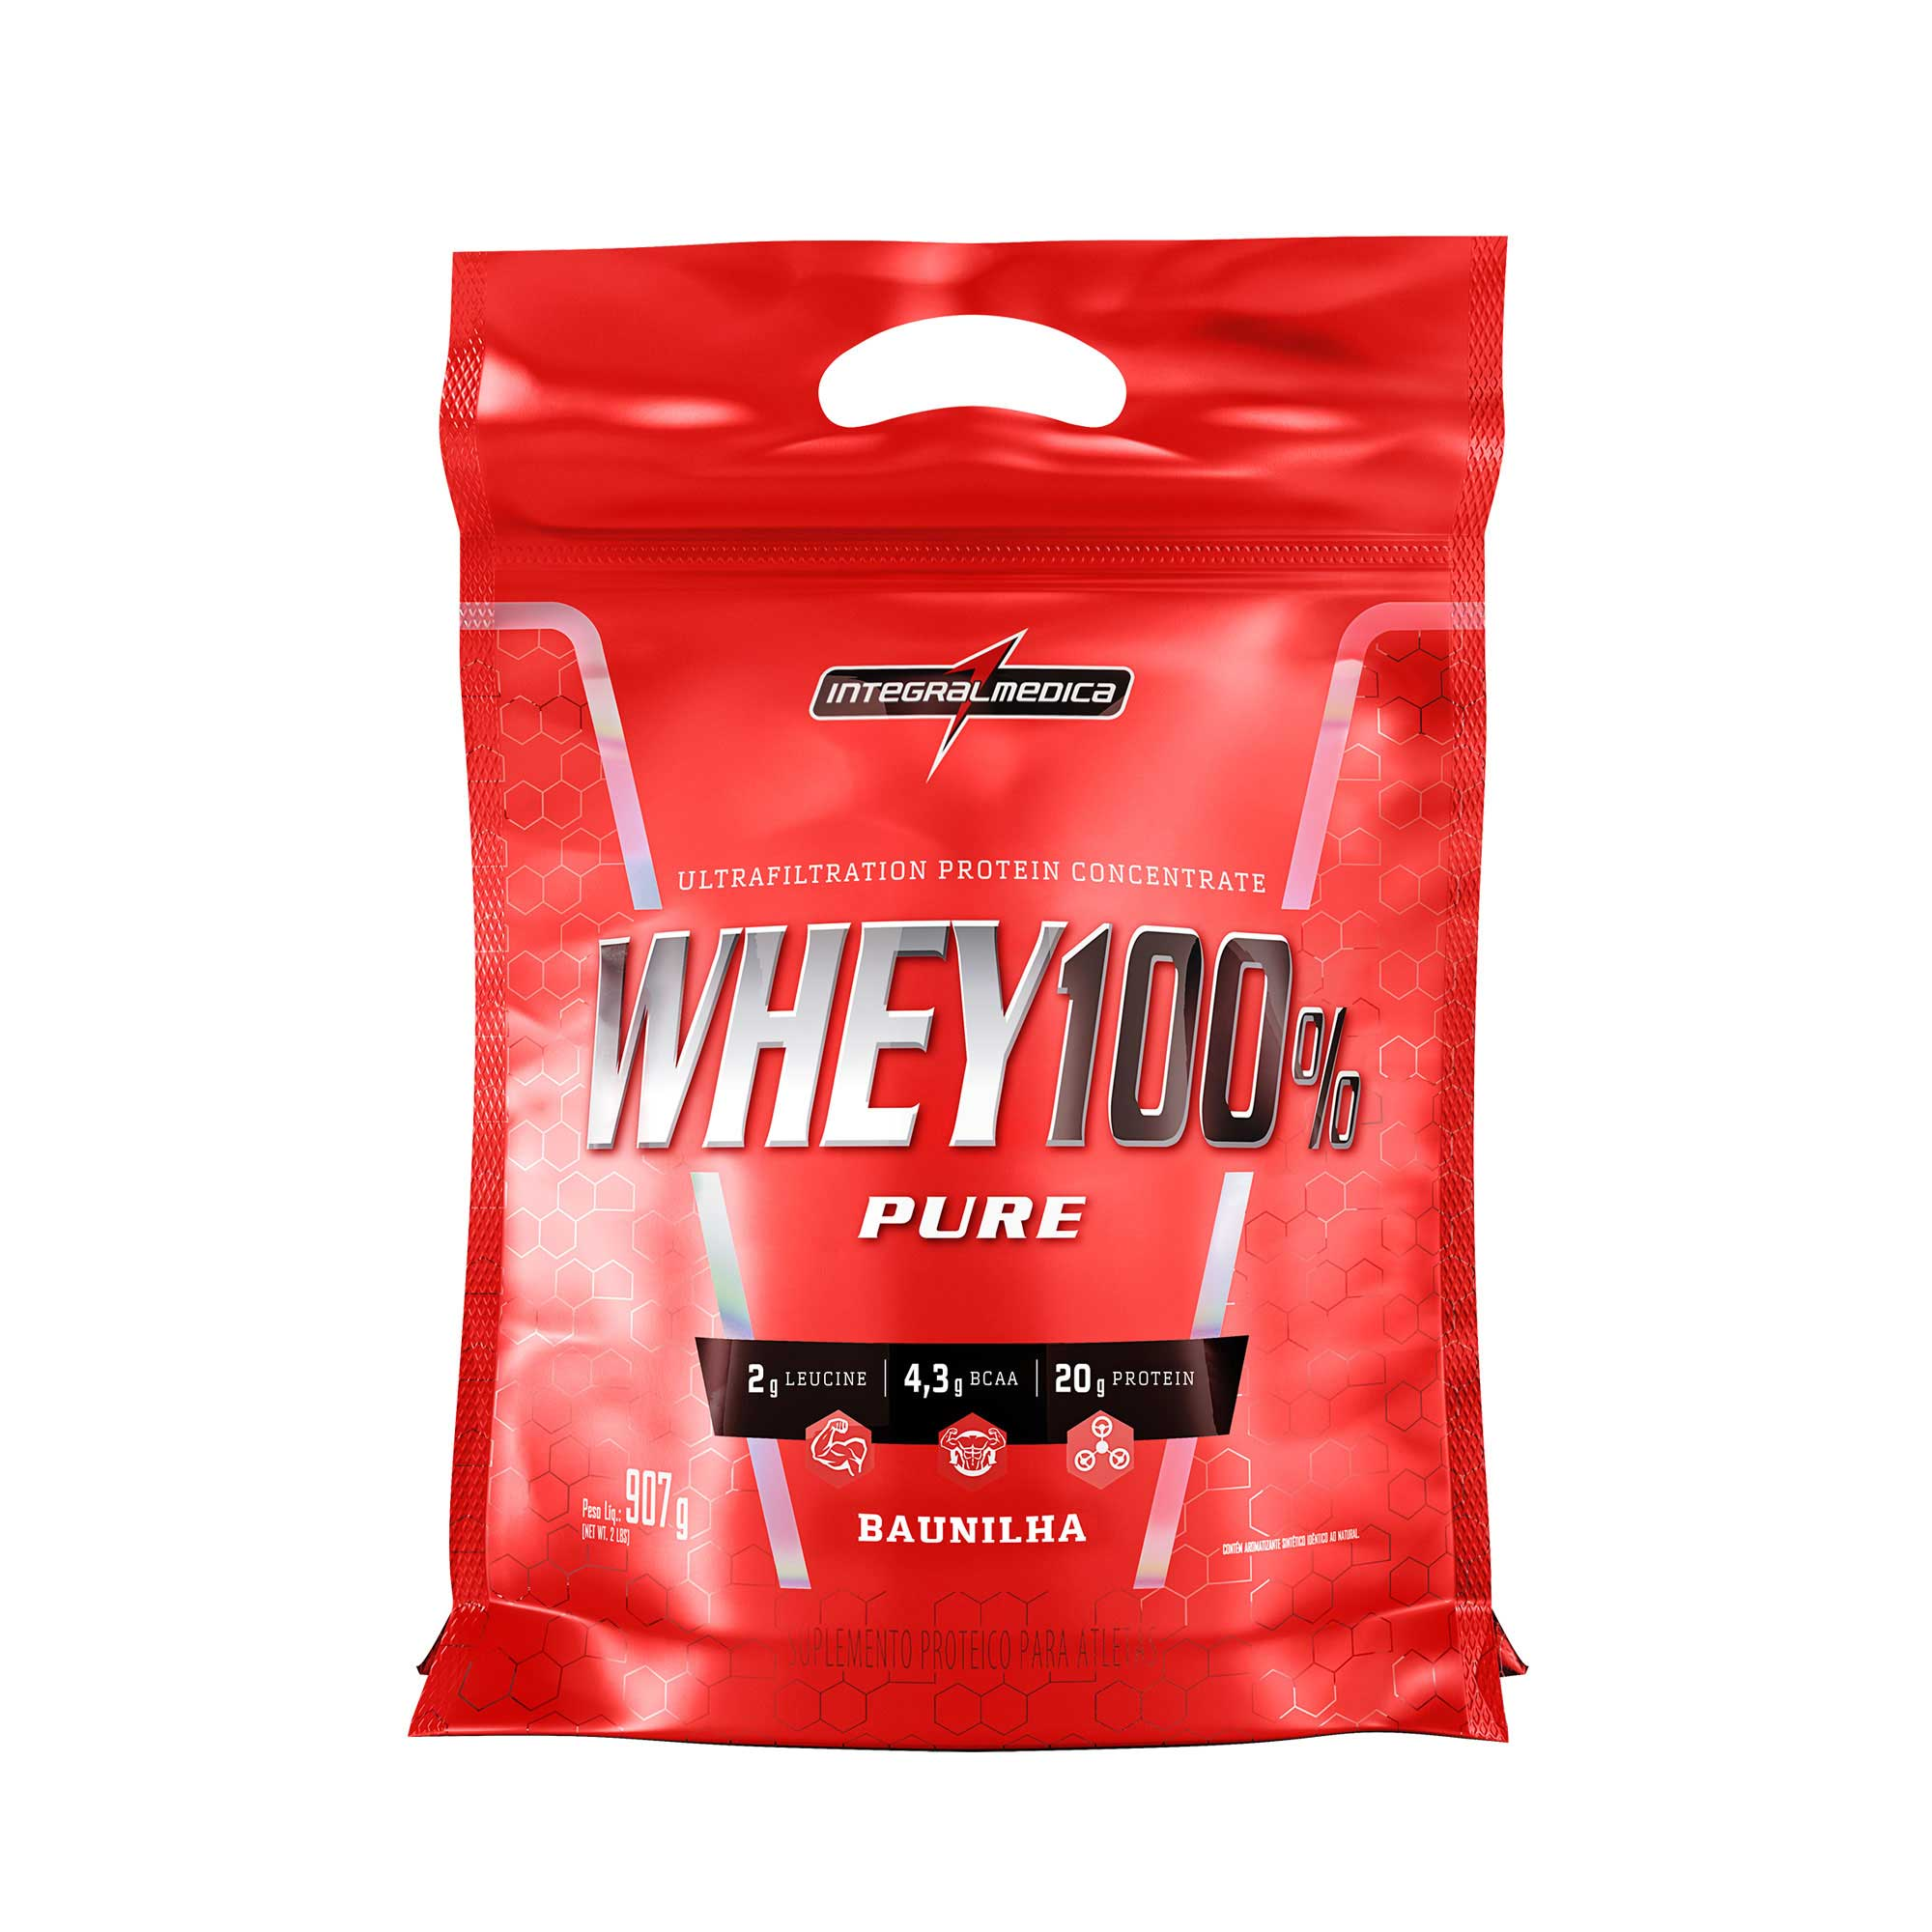 Whey 100% Pure Baunilha 907g Integralmedica